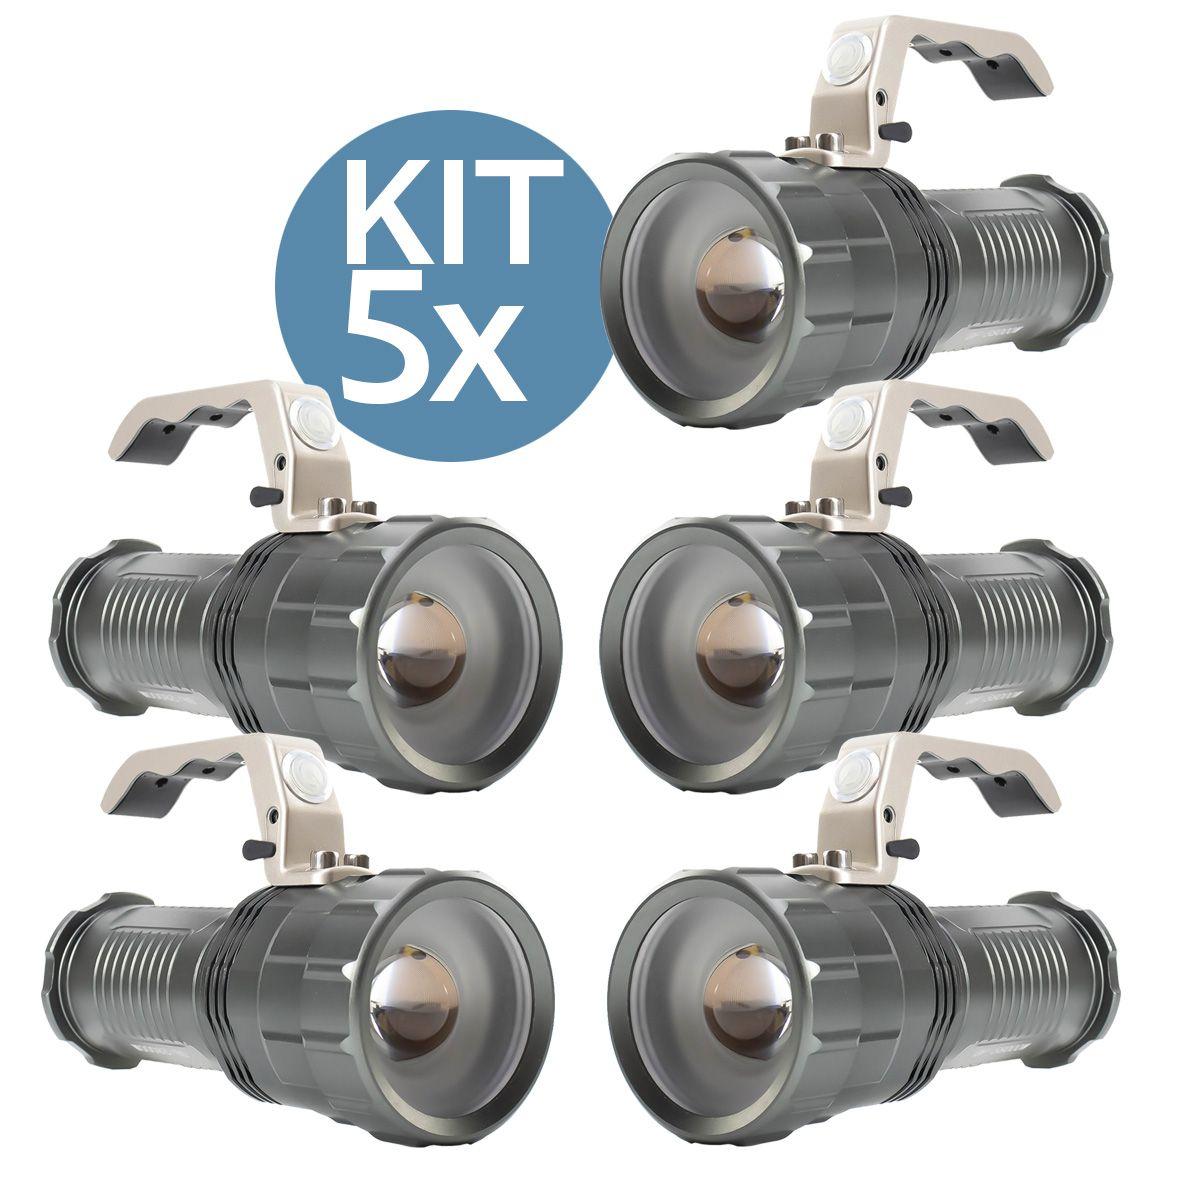 KIT 5x Lanterna Led Recarregável de 1200 Lumens B-Max BM-8806